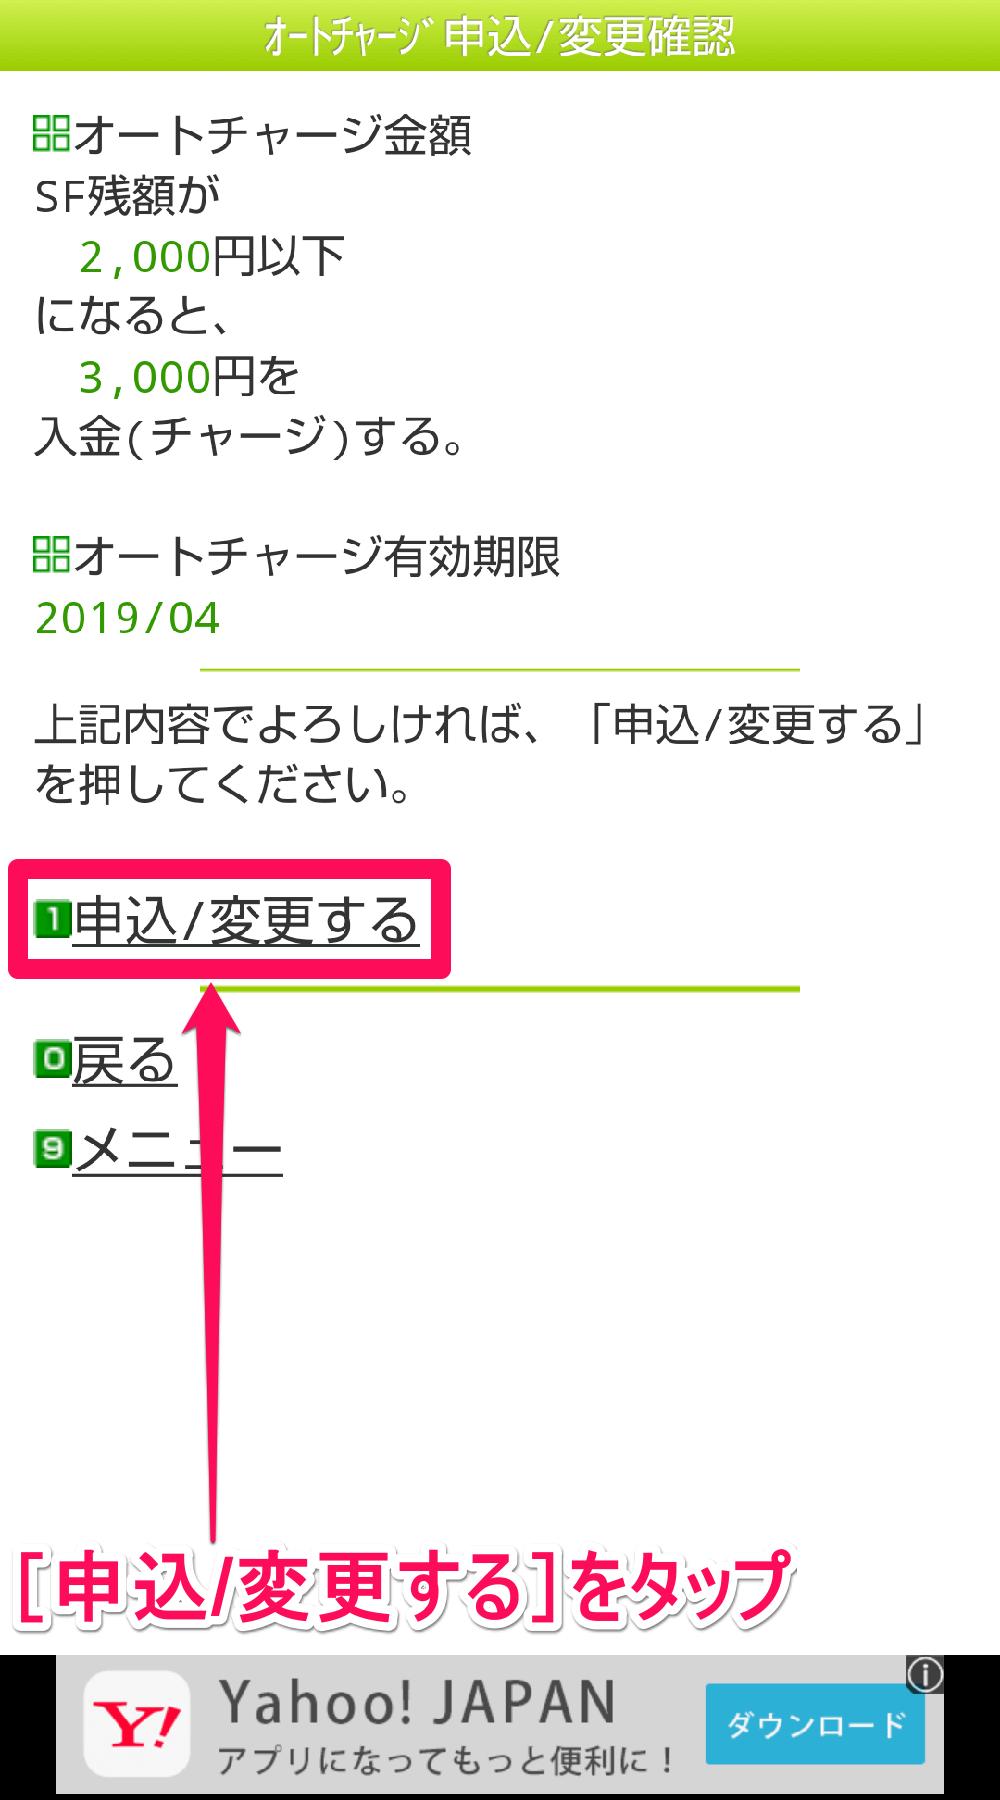 Android(アンドロイド)スマートフォン版「モバイルSuica」アプリの「オートチャージ申込/変更確認」画面